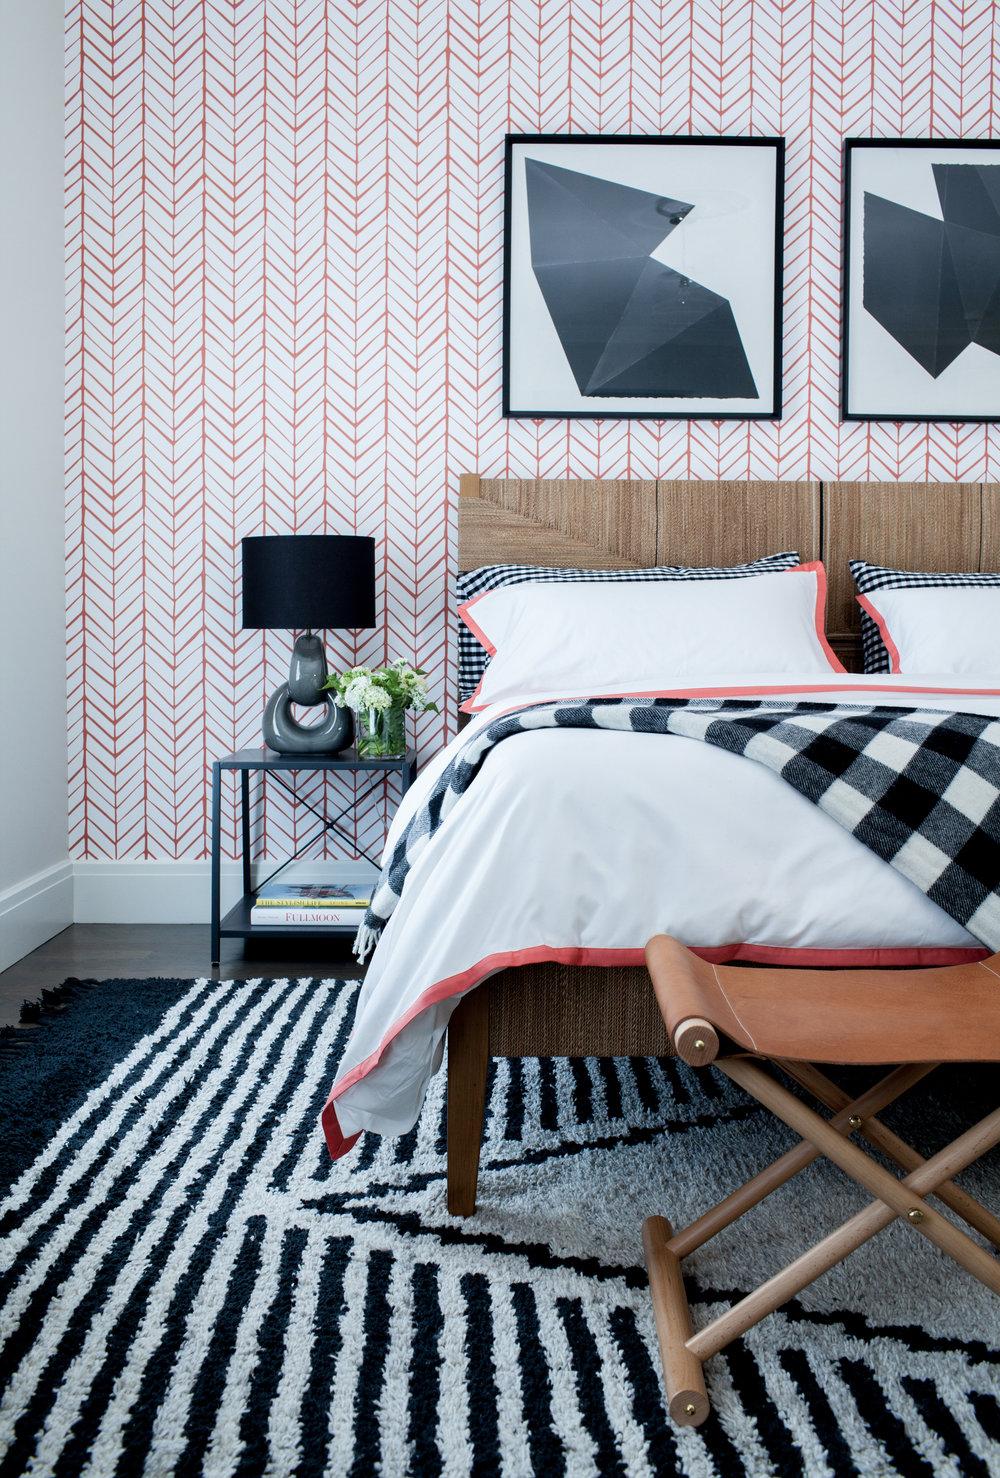 westport modern farmhouse by chango co guest bedroom detailjpg - Modern Farmhouse Bedroom